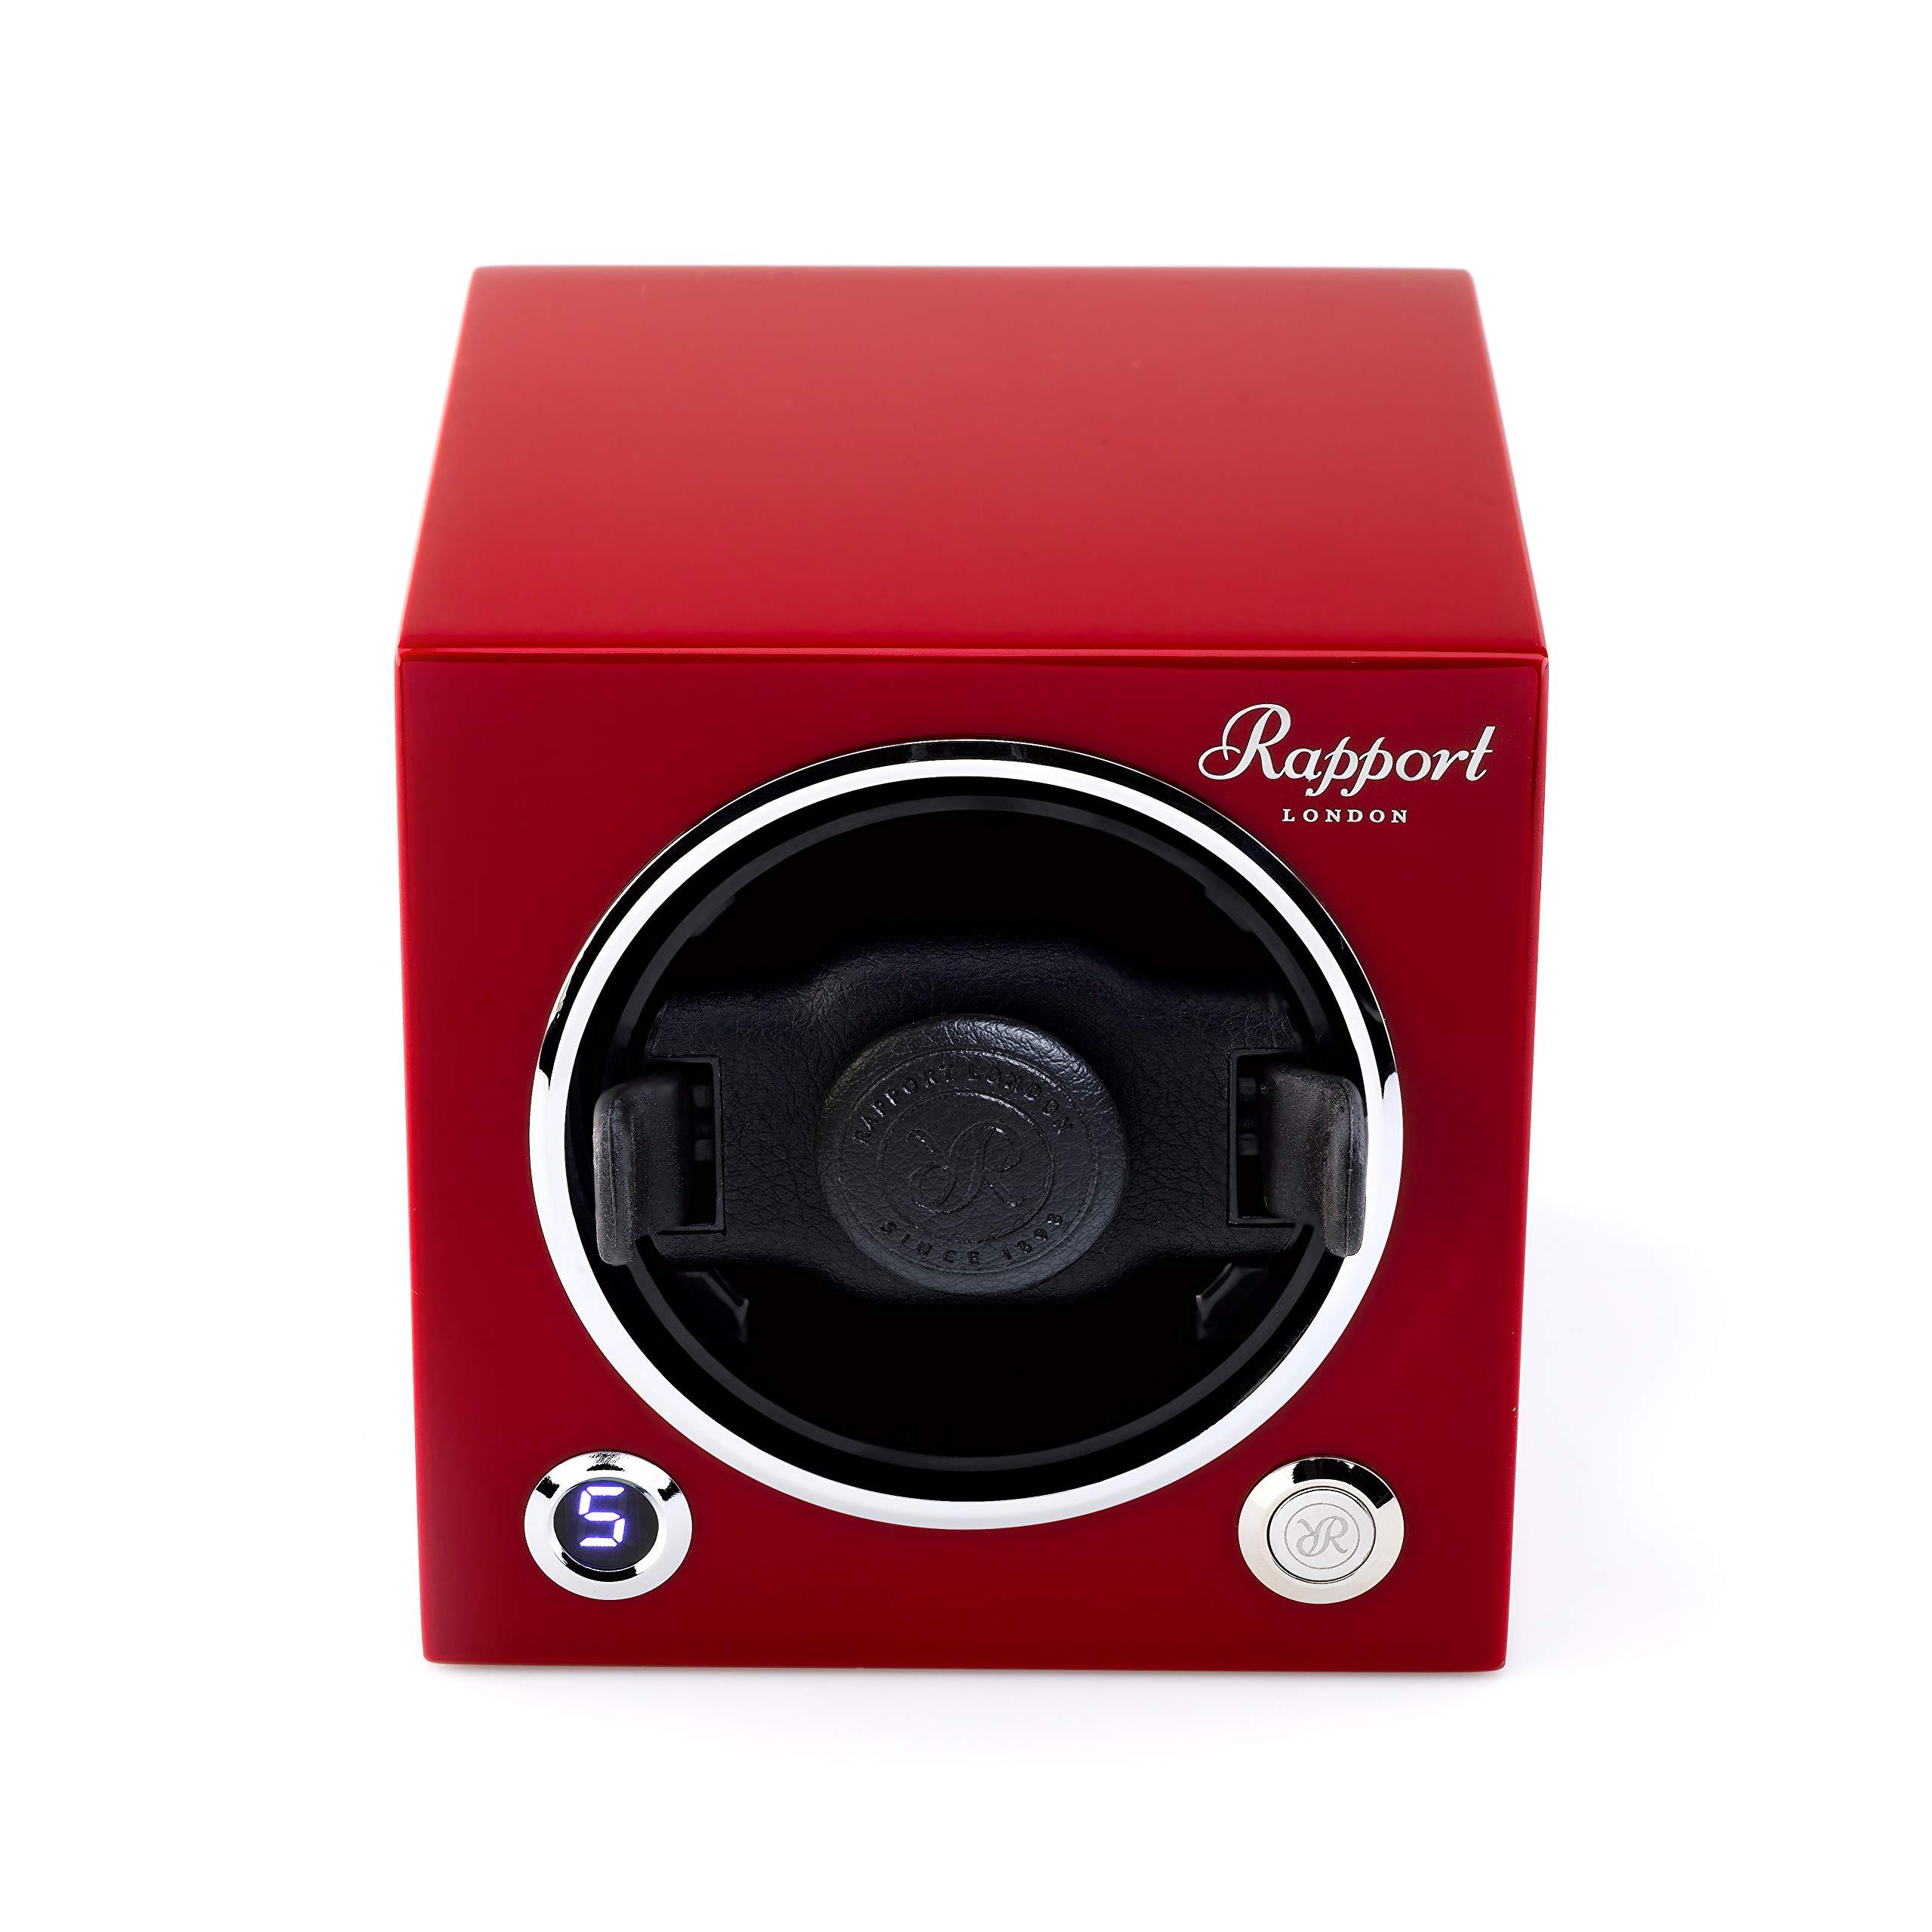 Watch Winder - Rapport London Evo MKII Cube Watch Winder in Crimson Red